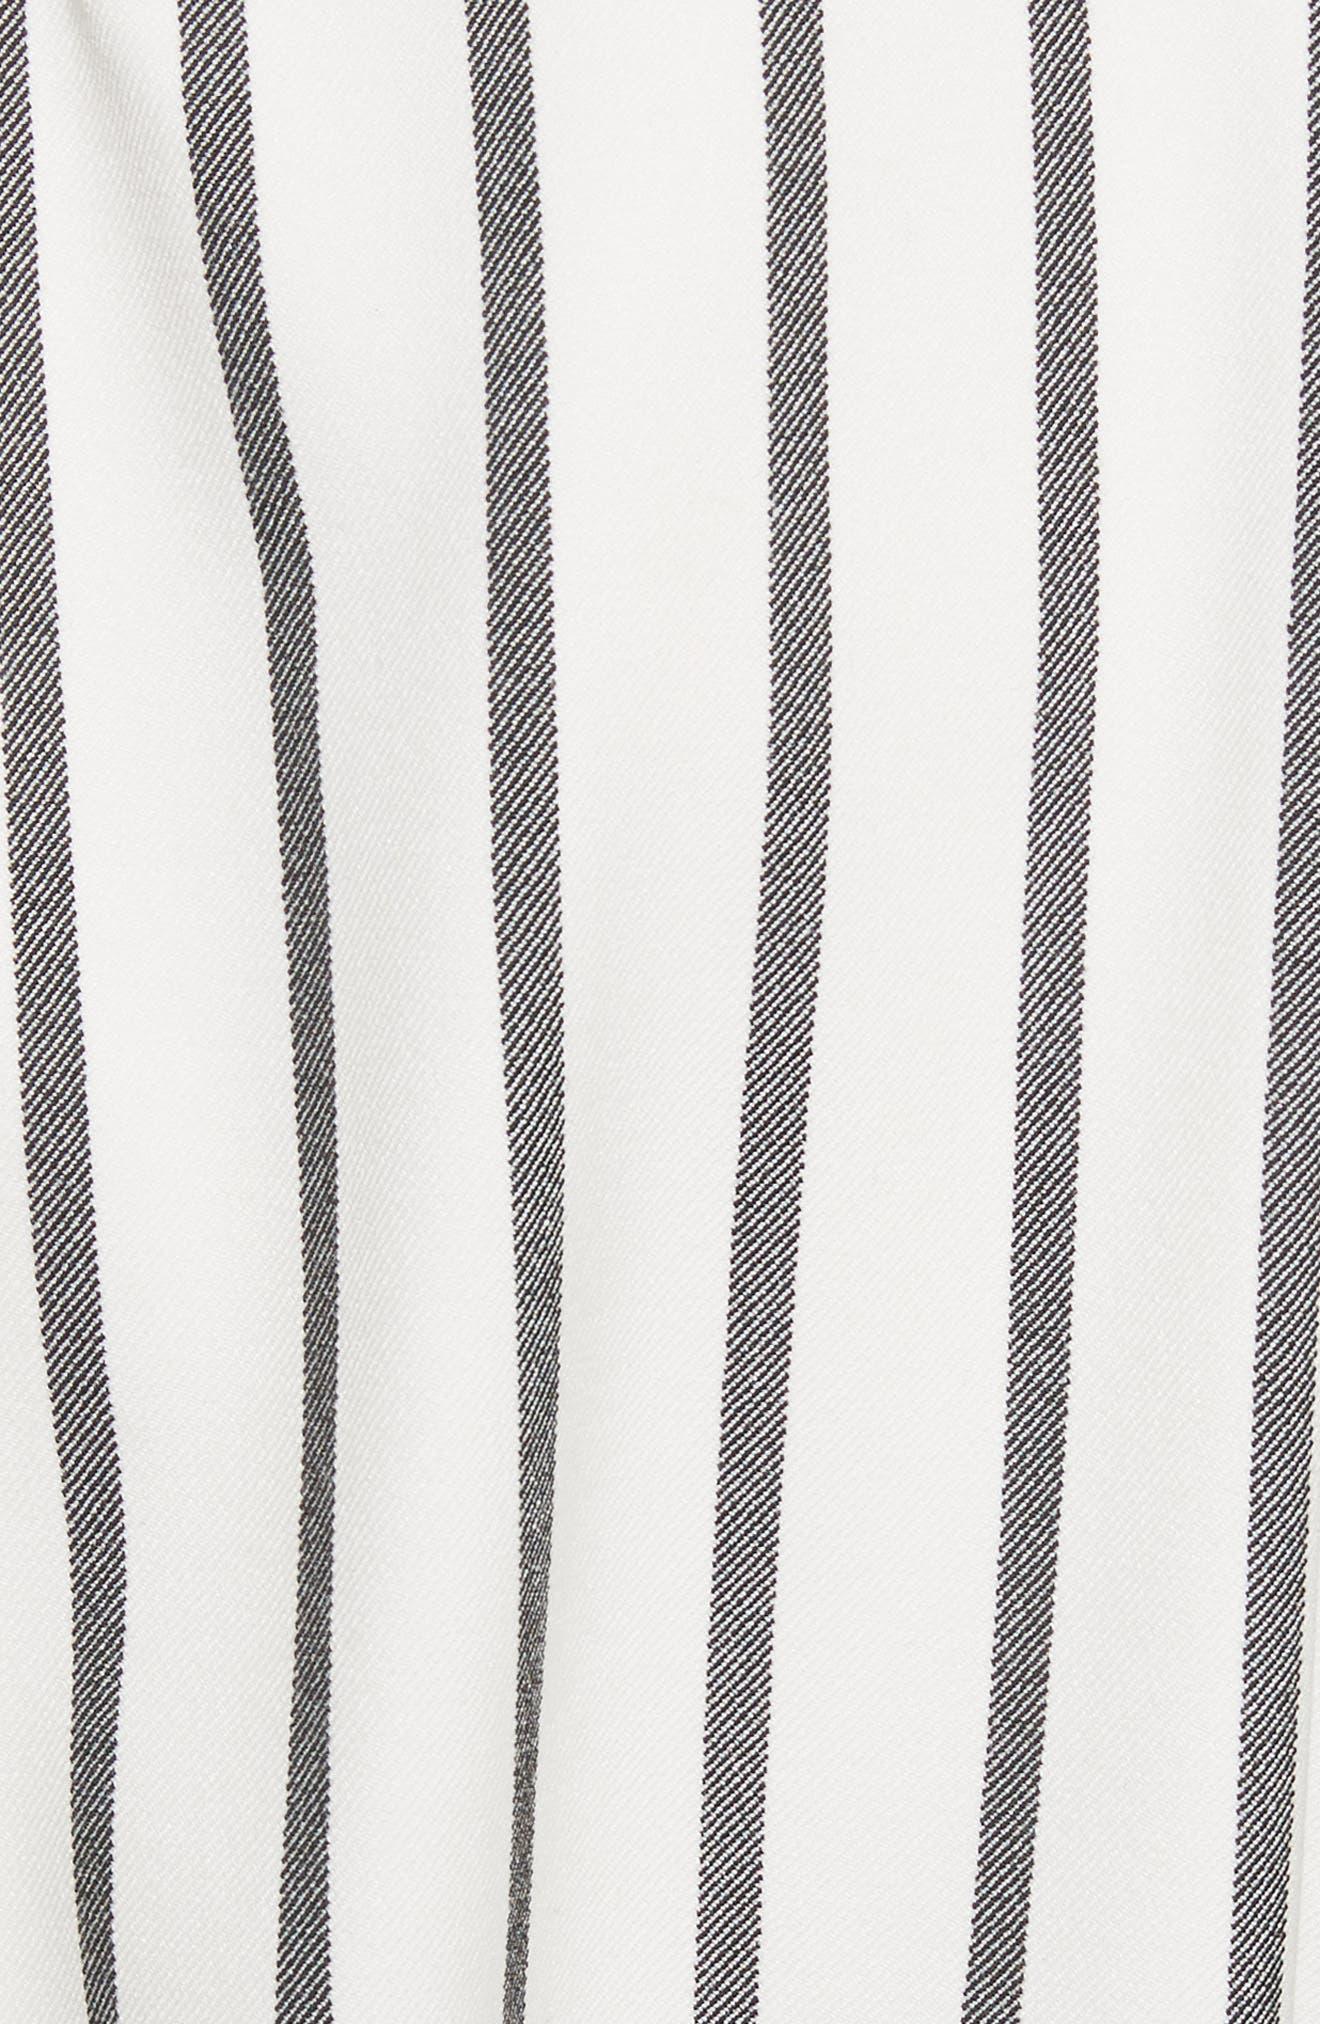 Lucci Stripe Sculpted Top,                             Alternate thumbnail 5, color,